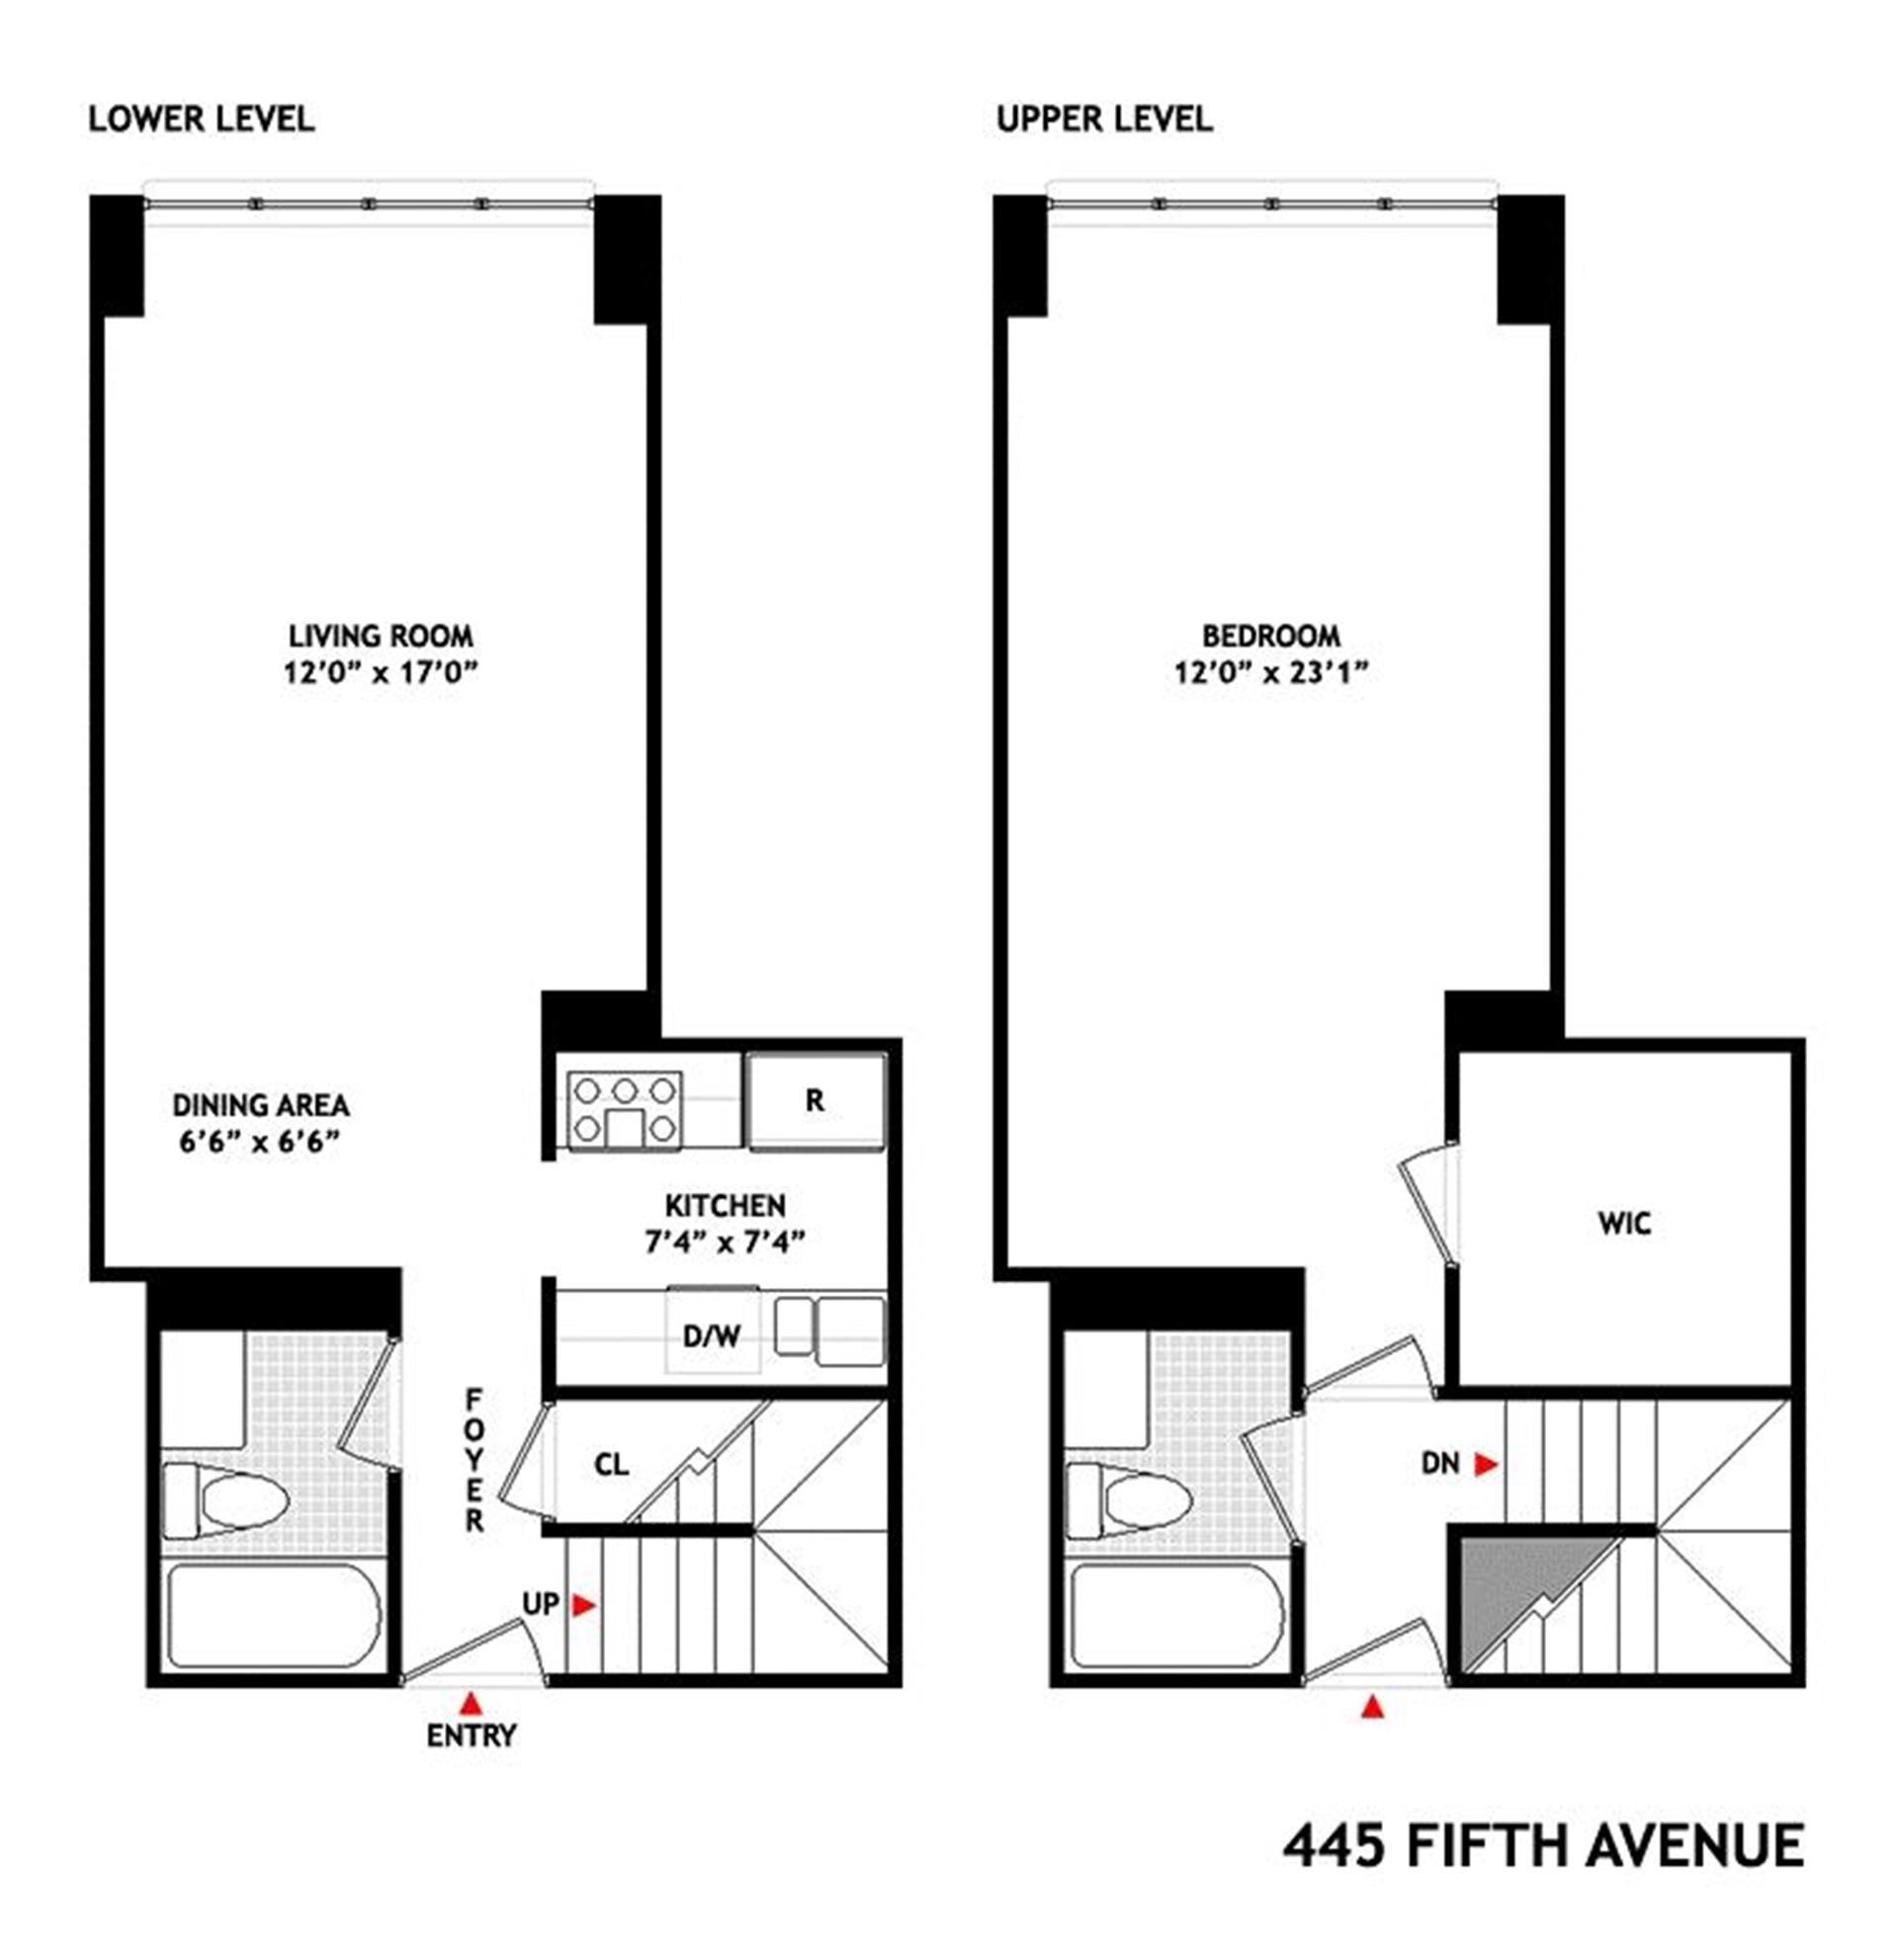 Floor plan of Fifth Avenue Tower Condominium, 445 Fifth Avenue, 31B - Murray Hill, New York